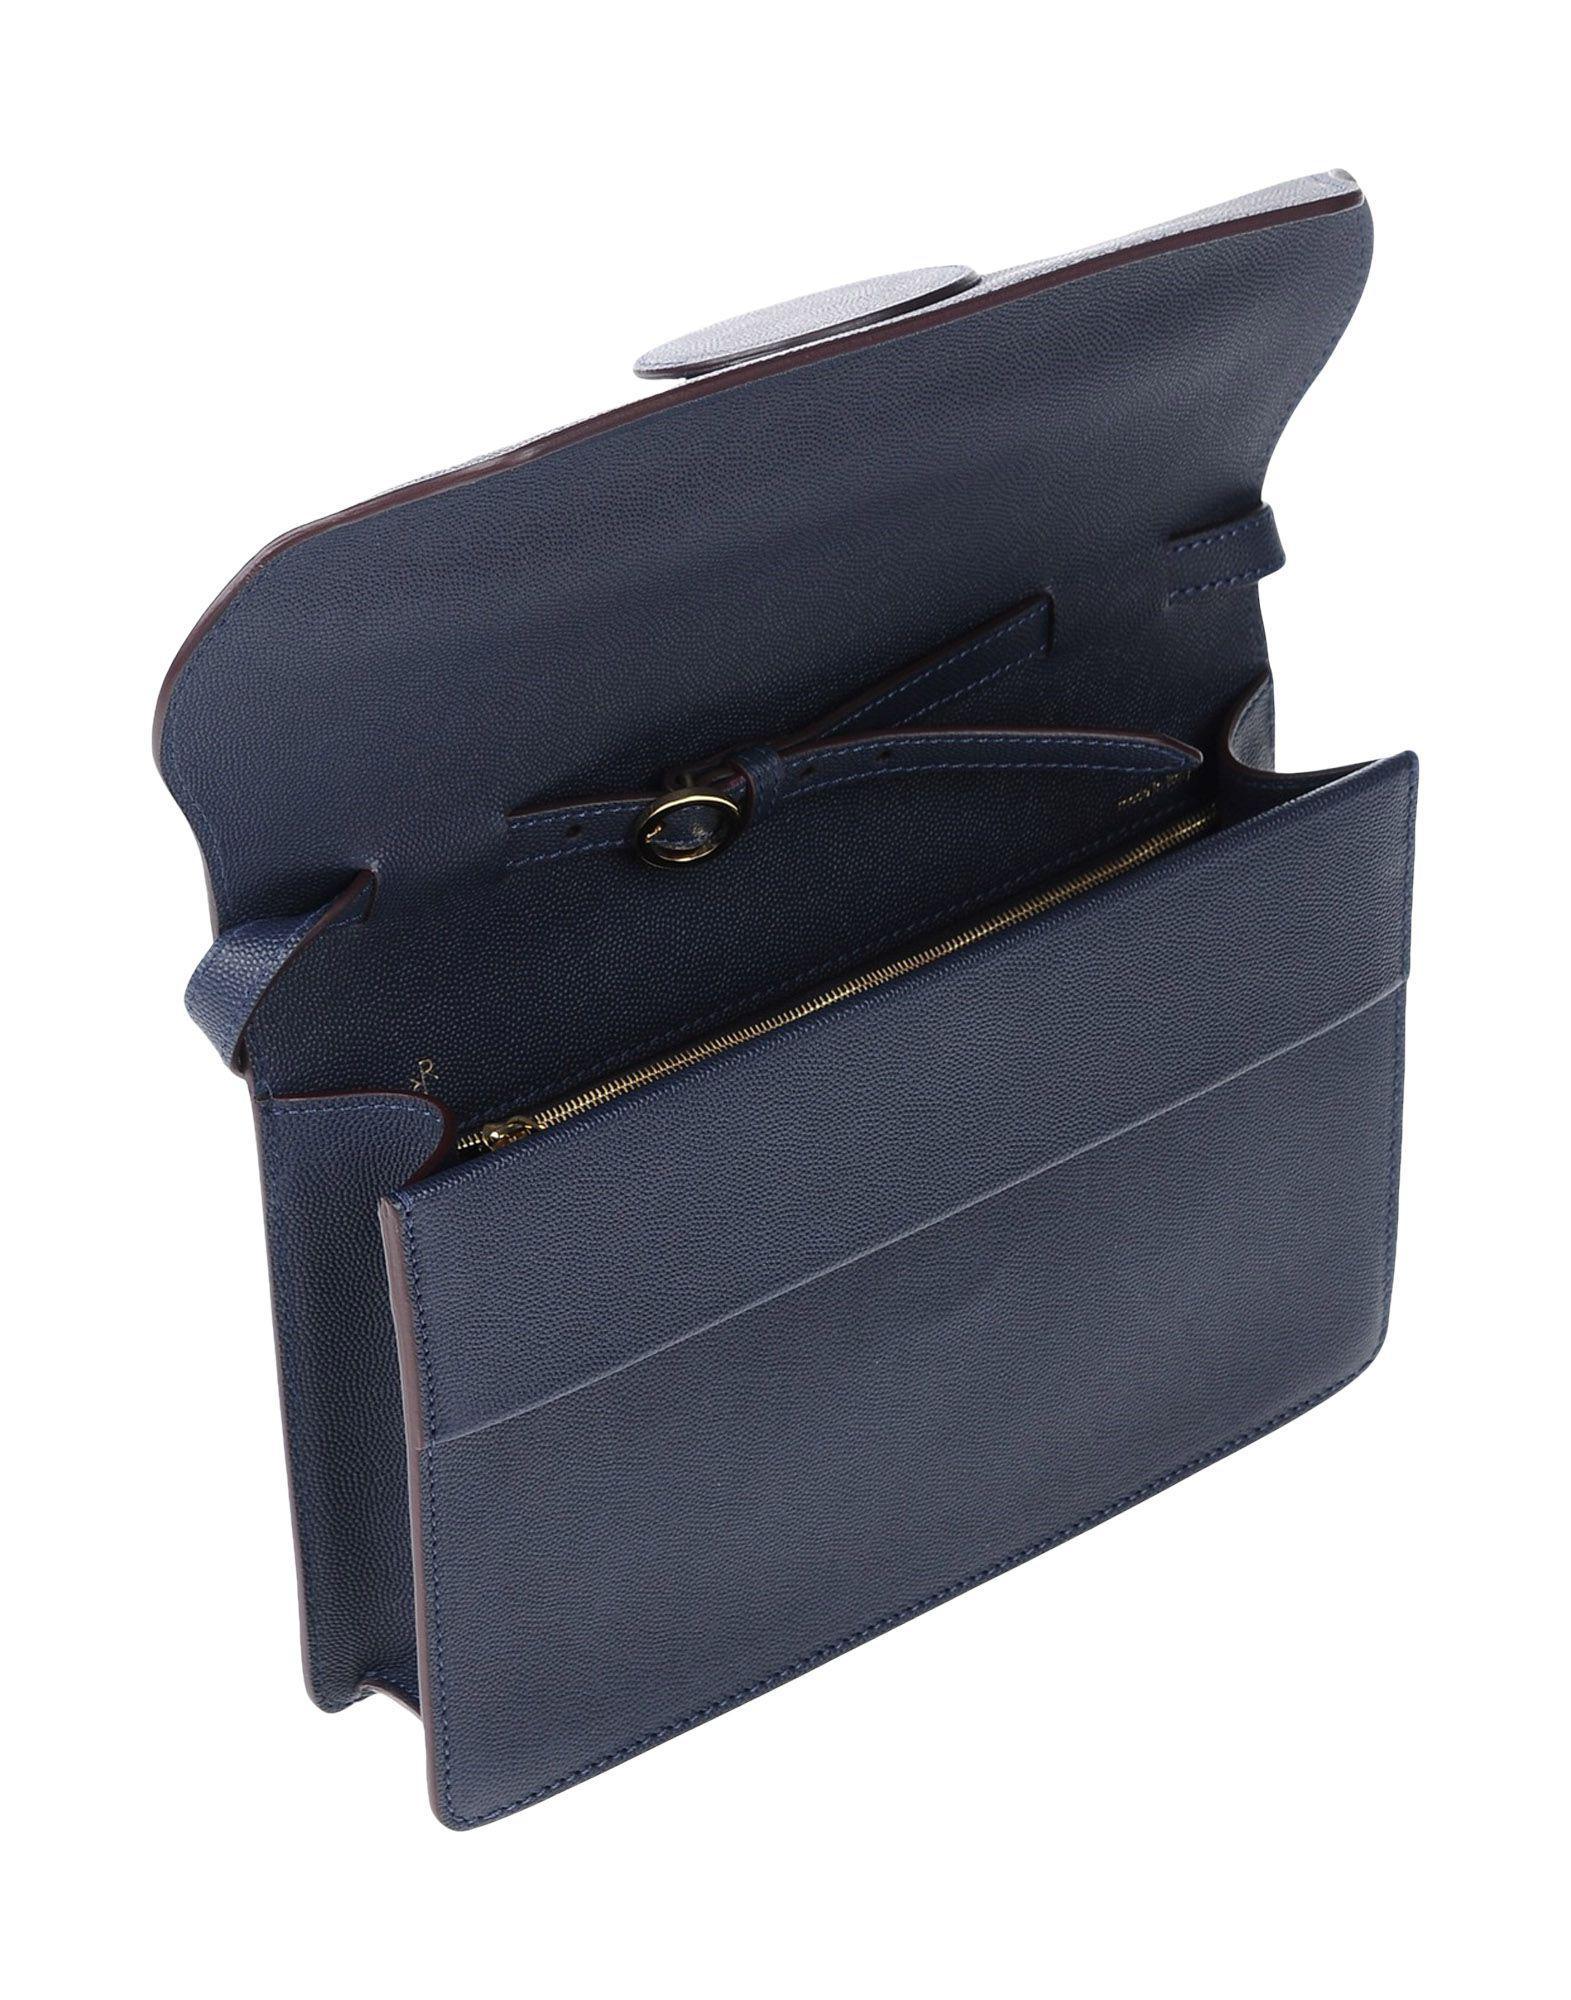 ROKSANDA Leather Cross-body Bag in Dark Blue (Blue)